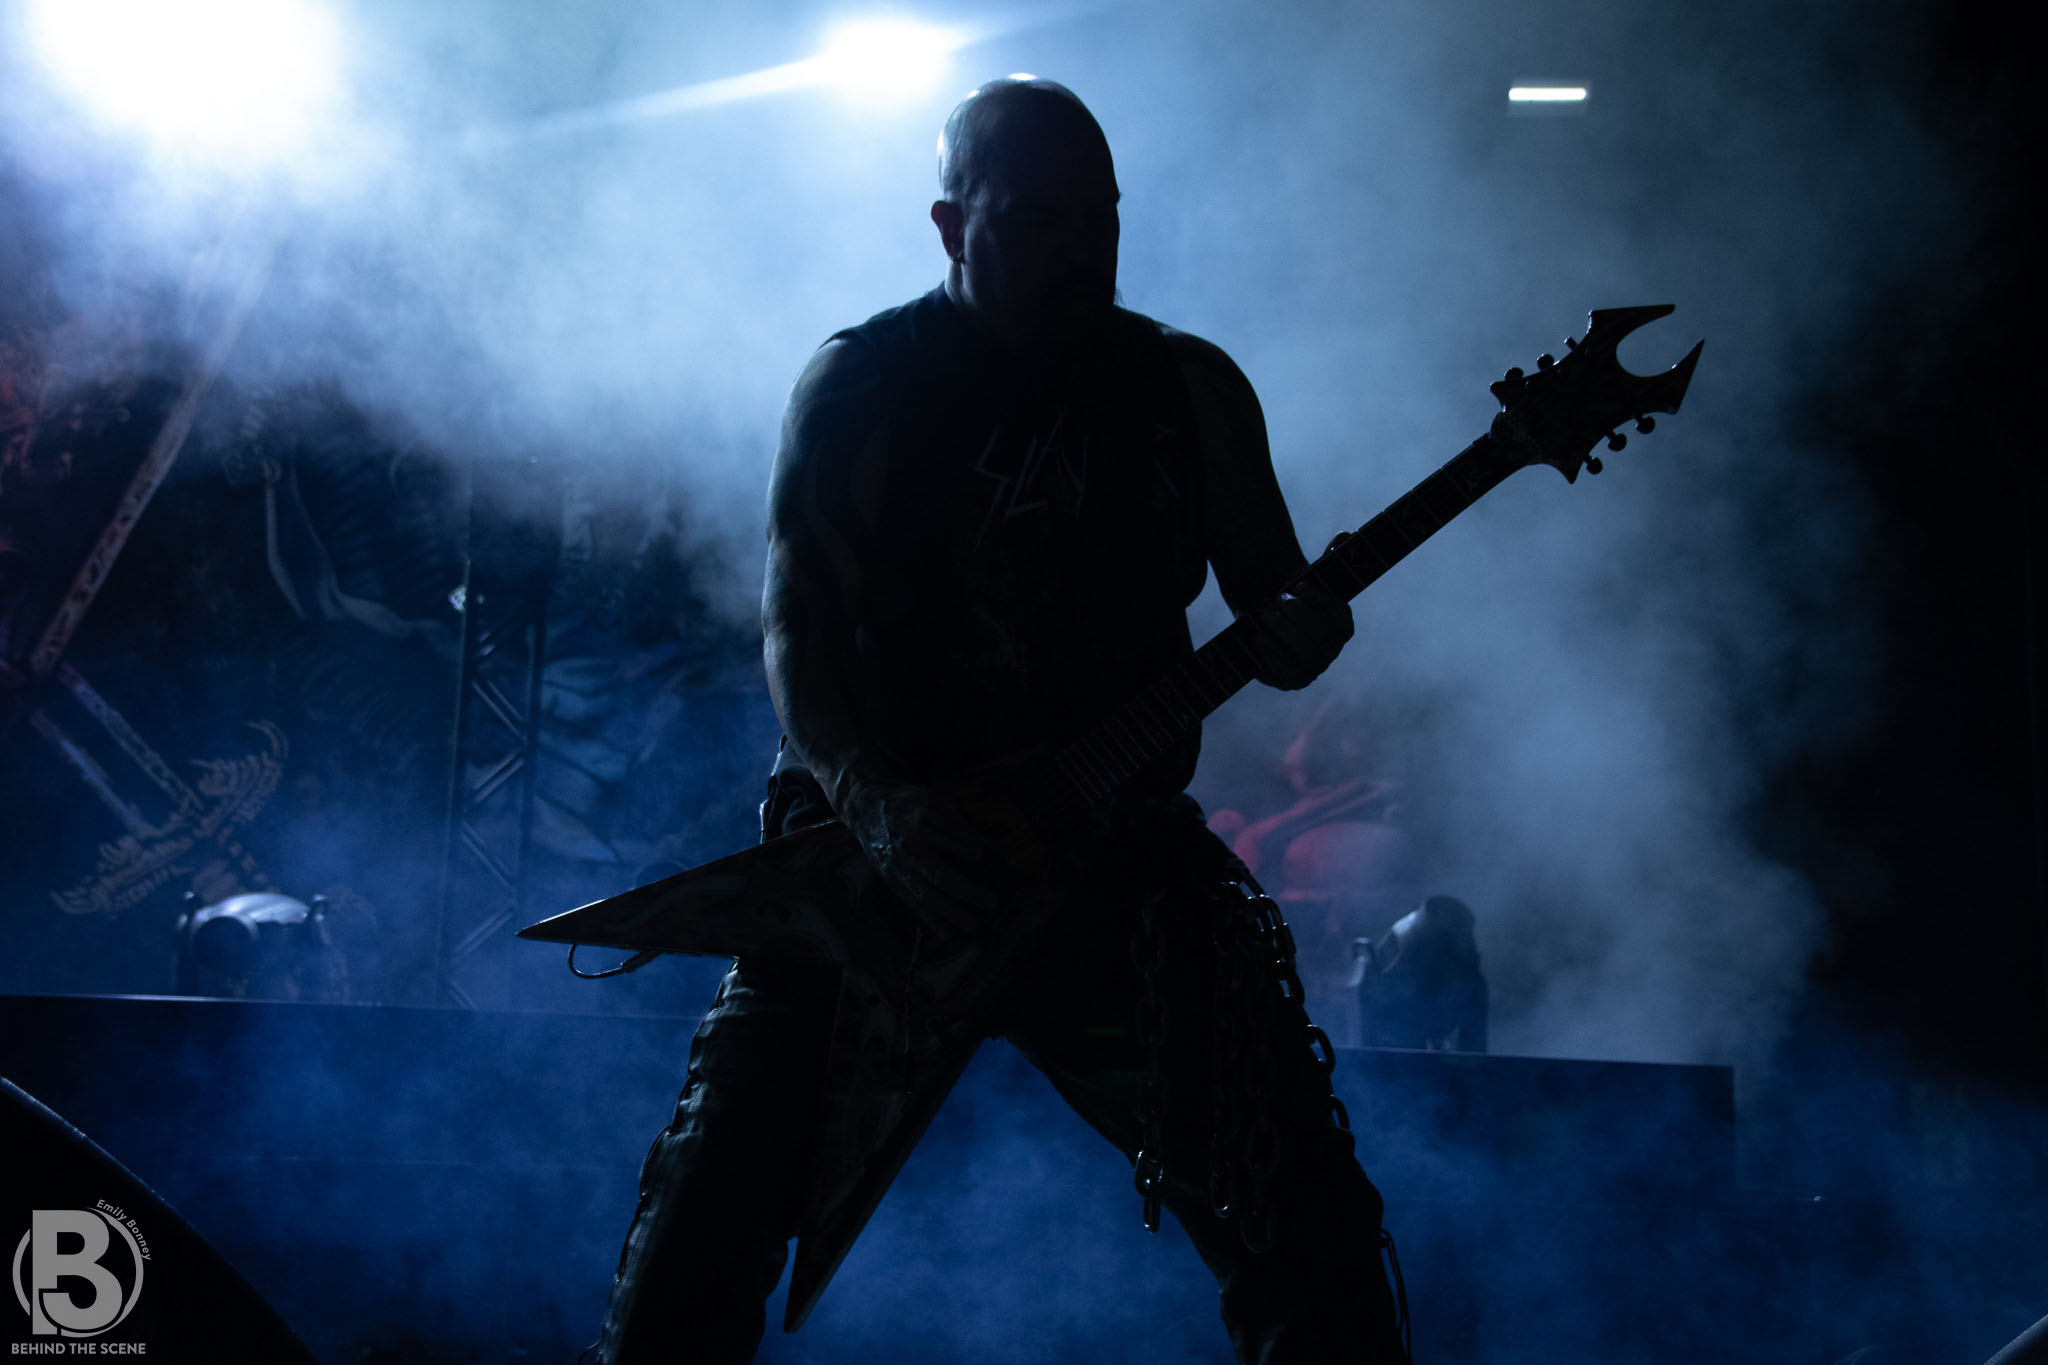 052519 Slayer EB5785.jpg